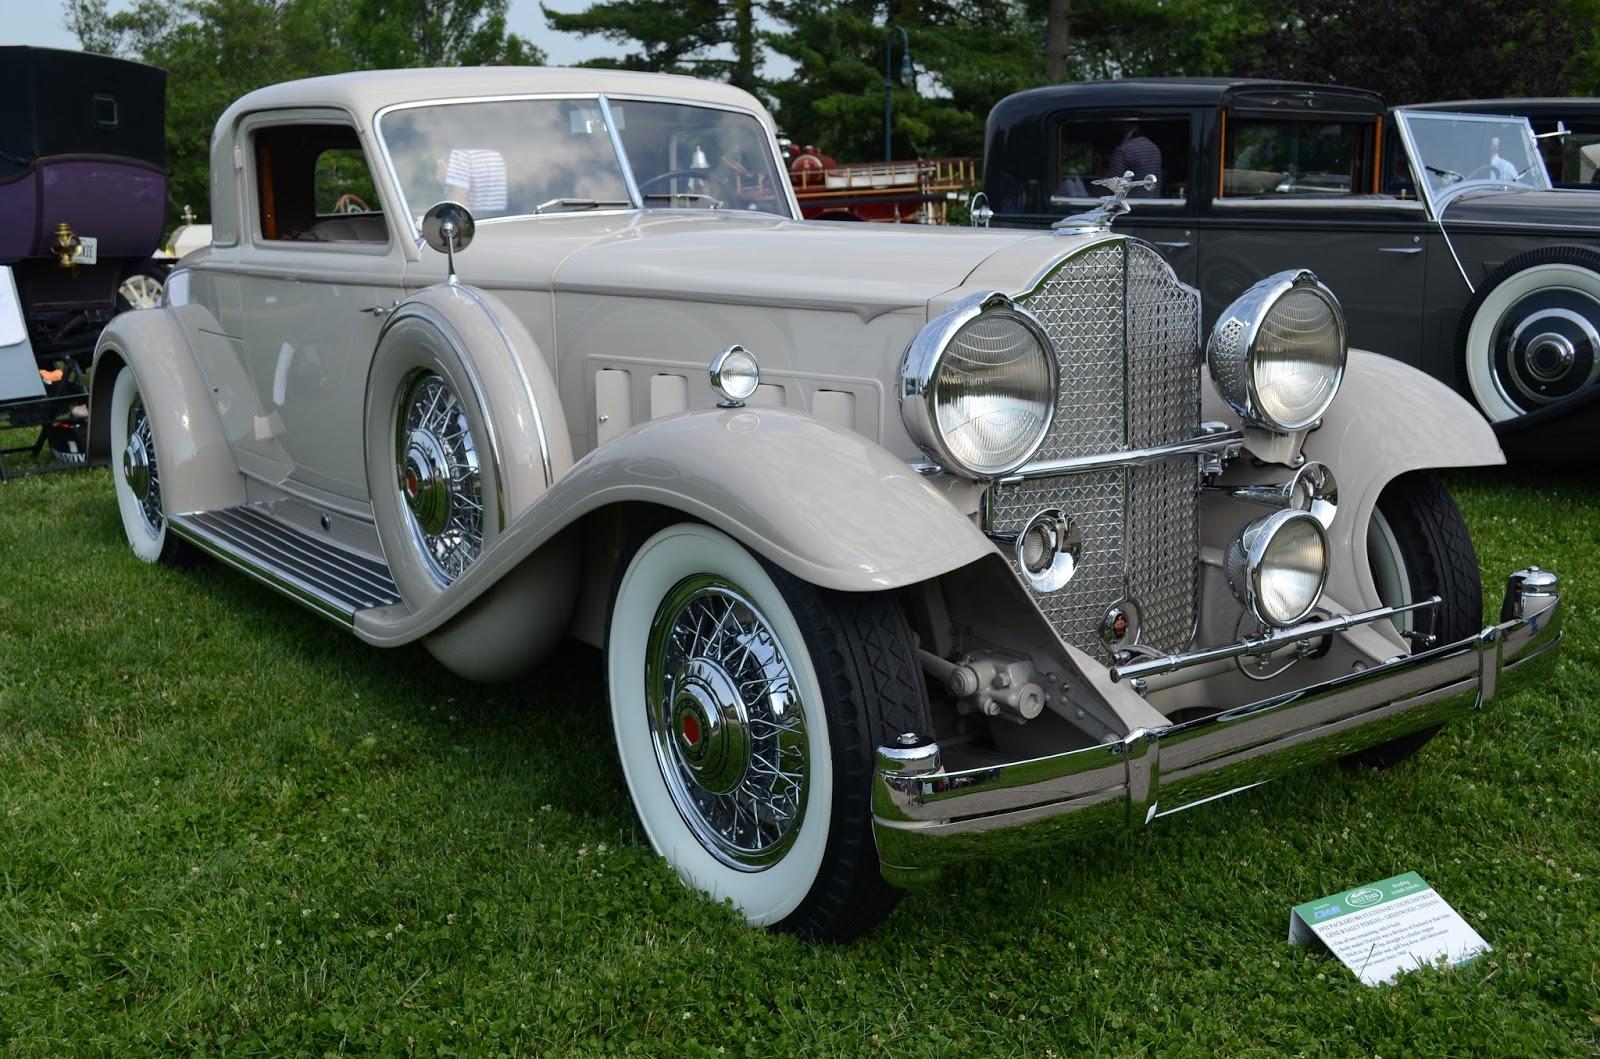 Turnerbudds Car Blog: More Pre-War Classics at Ault Park